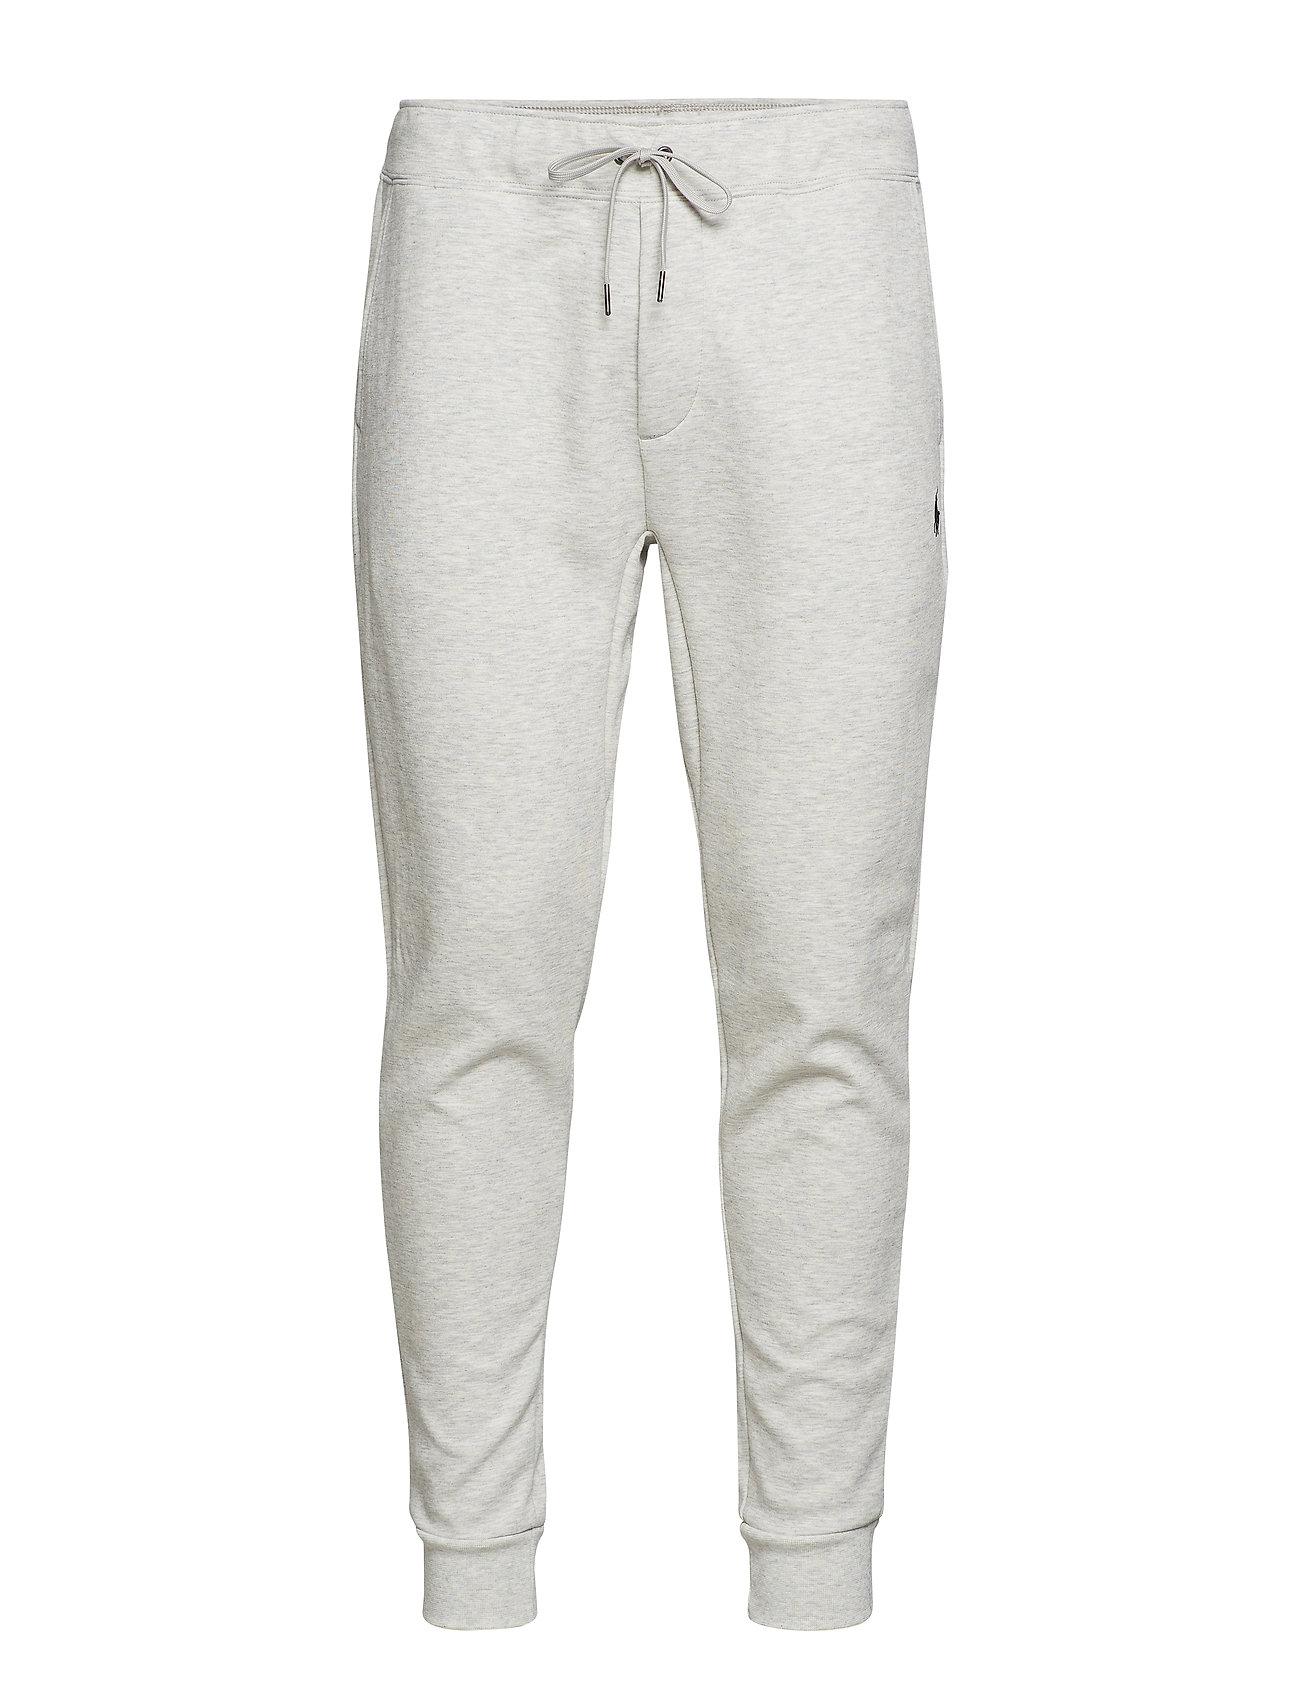 Polo Ralph Lauren Double-Knit Jogger - LT SPORT HEATHER